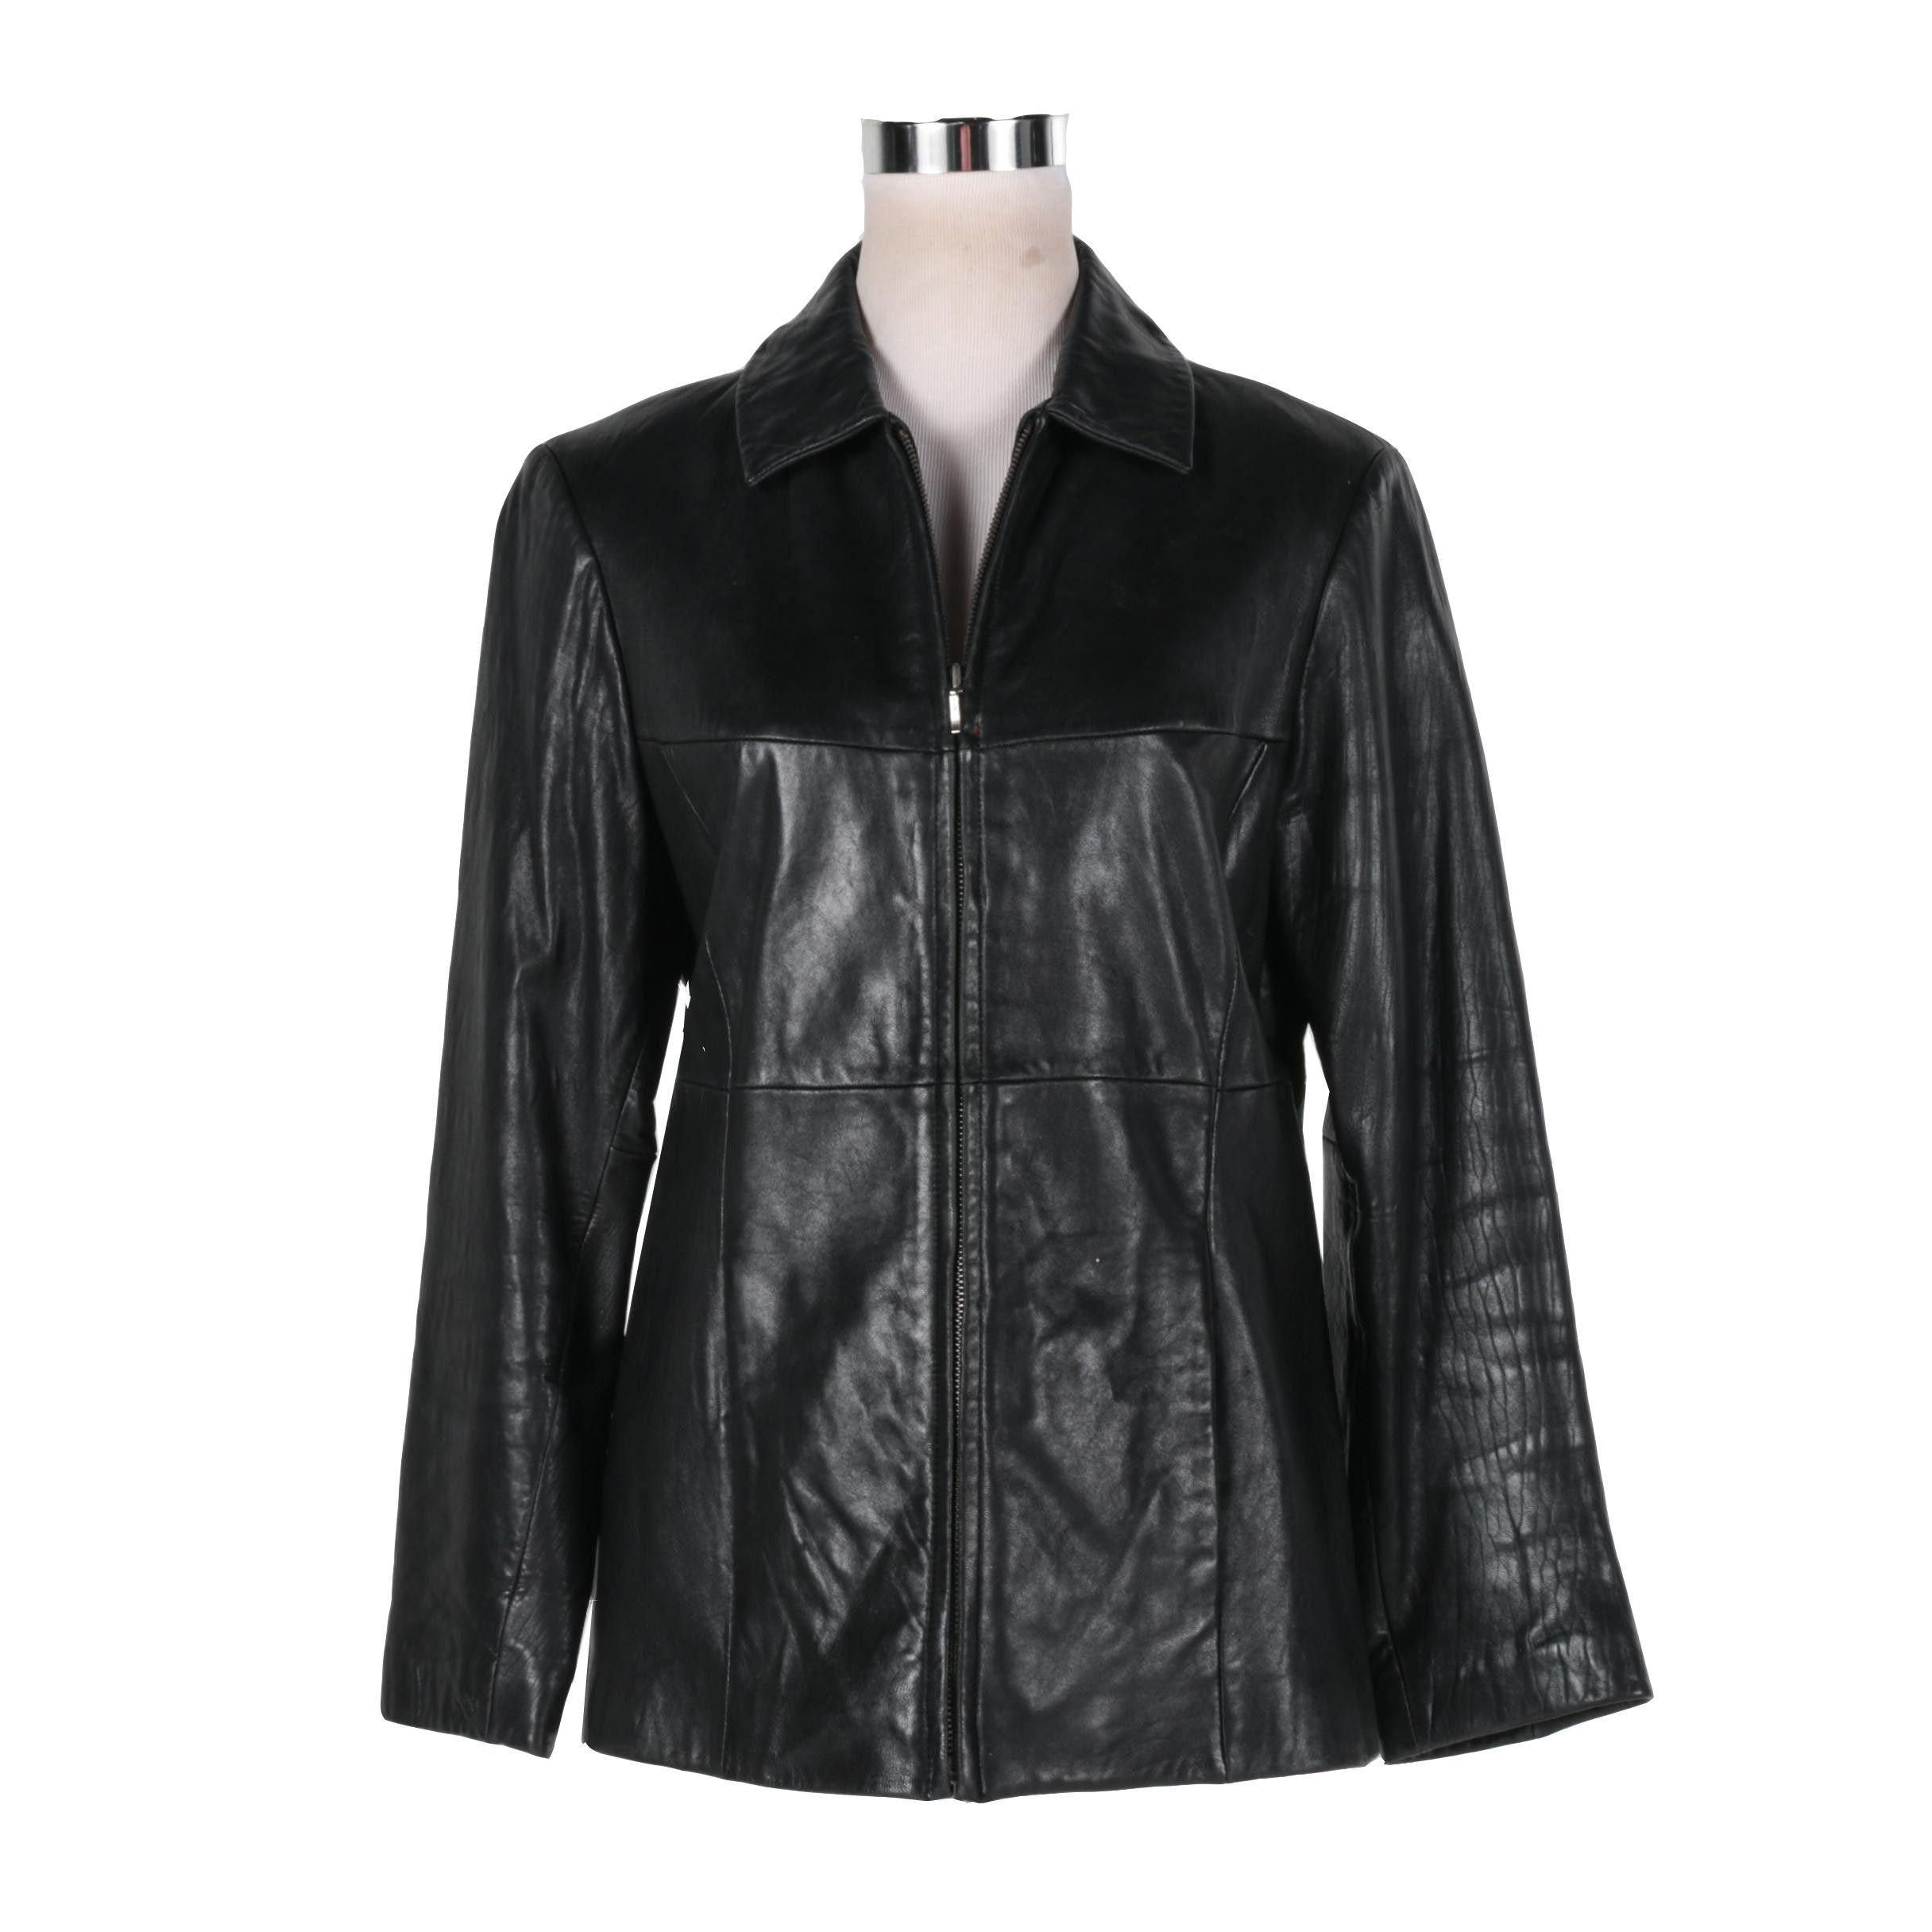 Men's Merona Black Leather Jacket